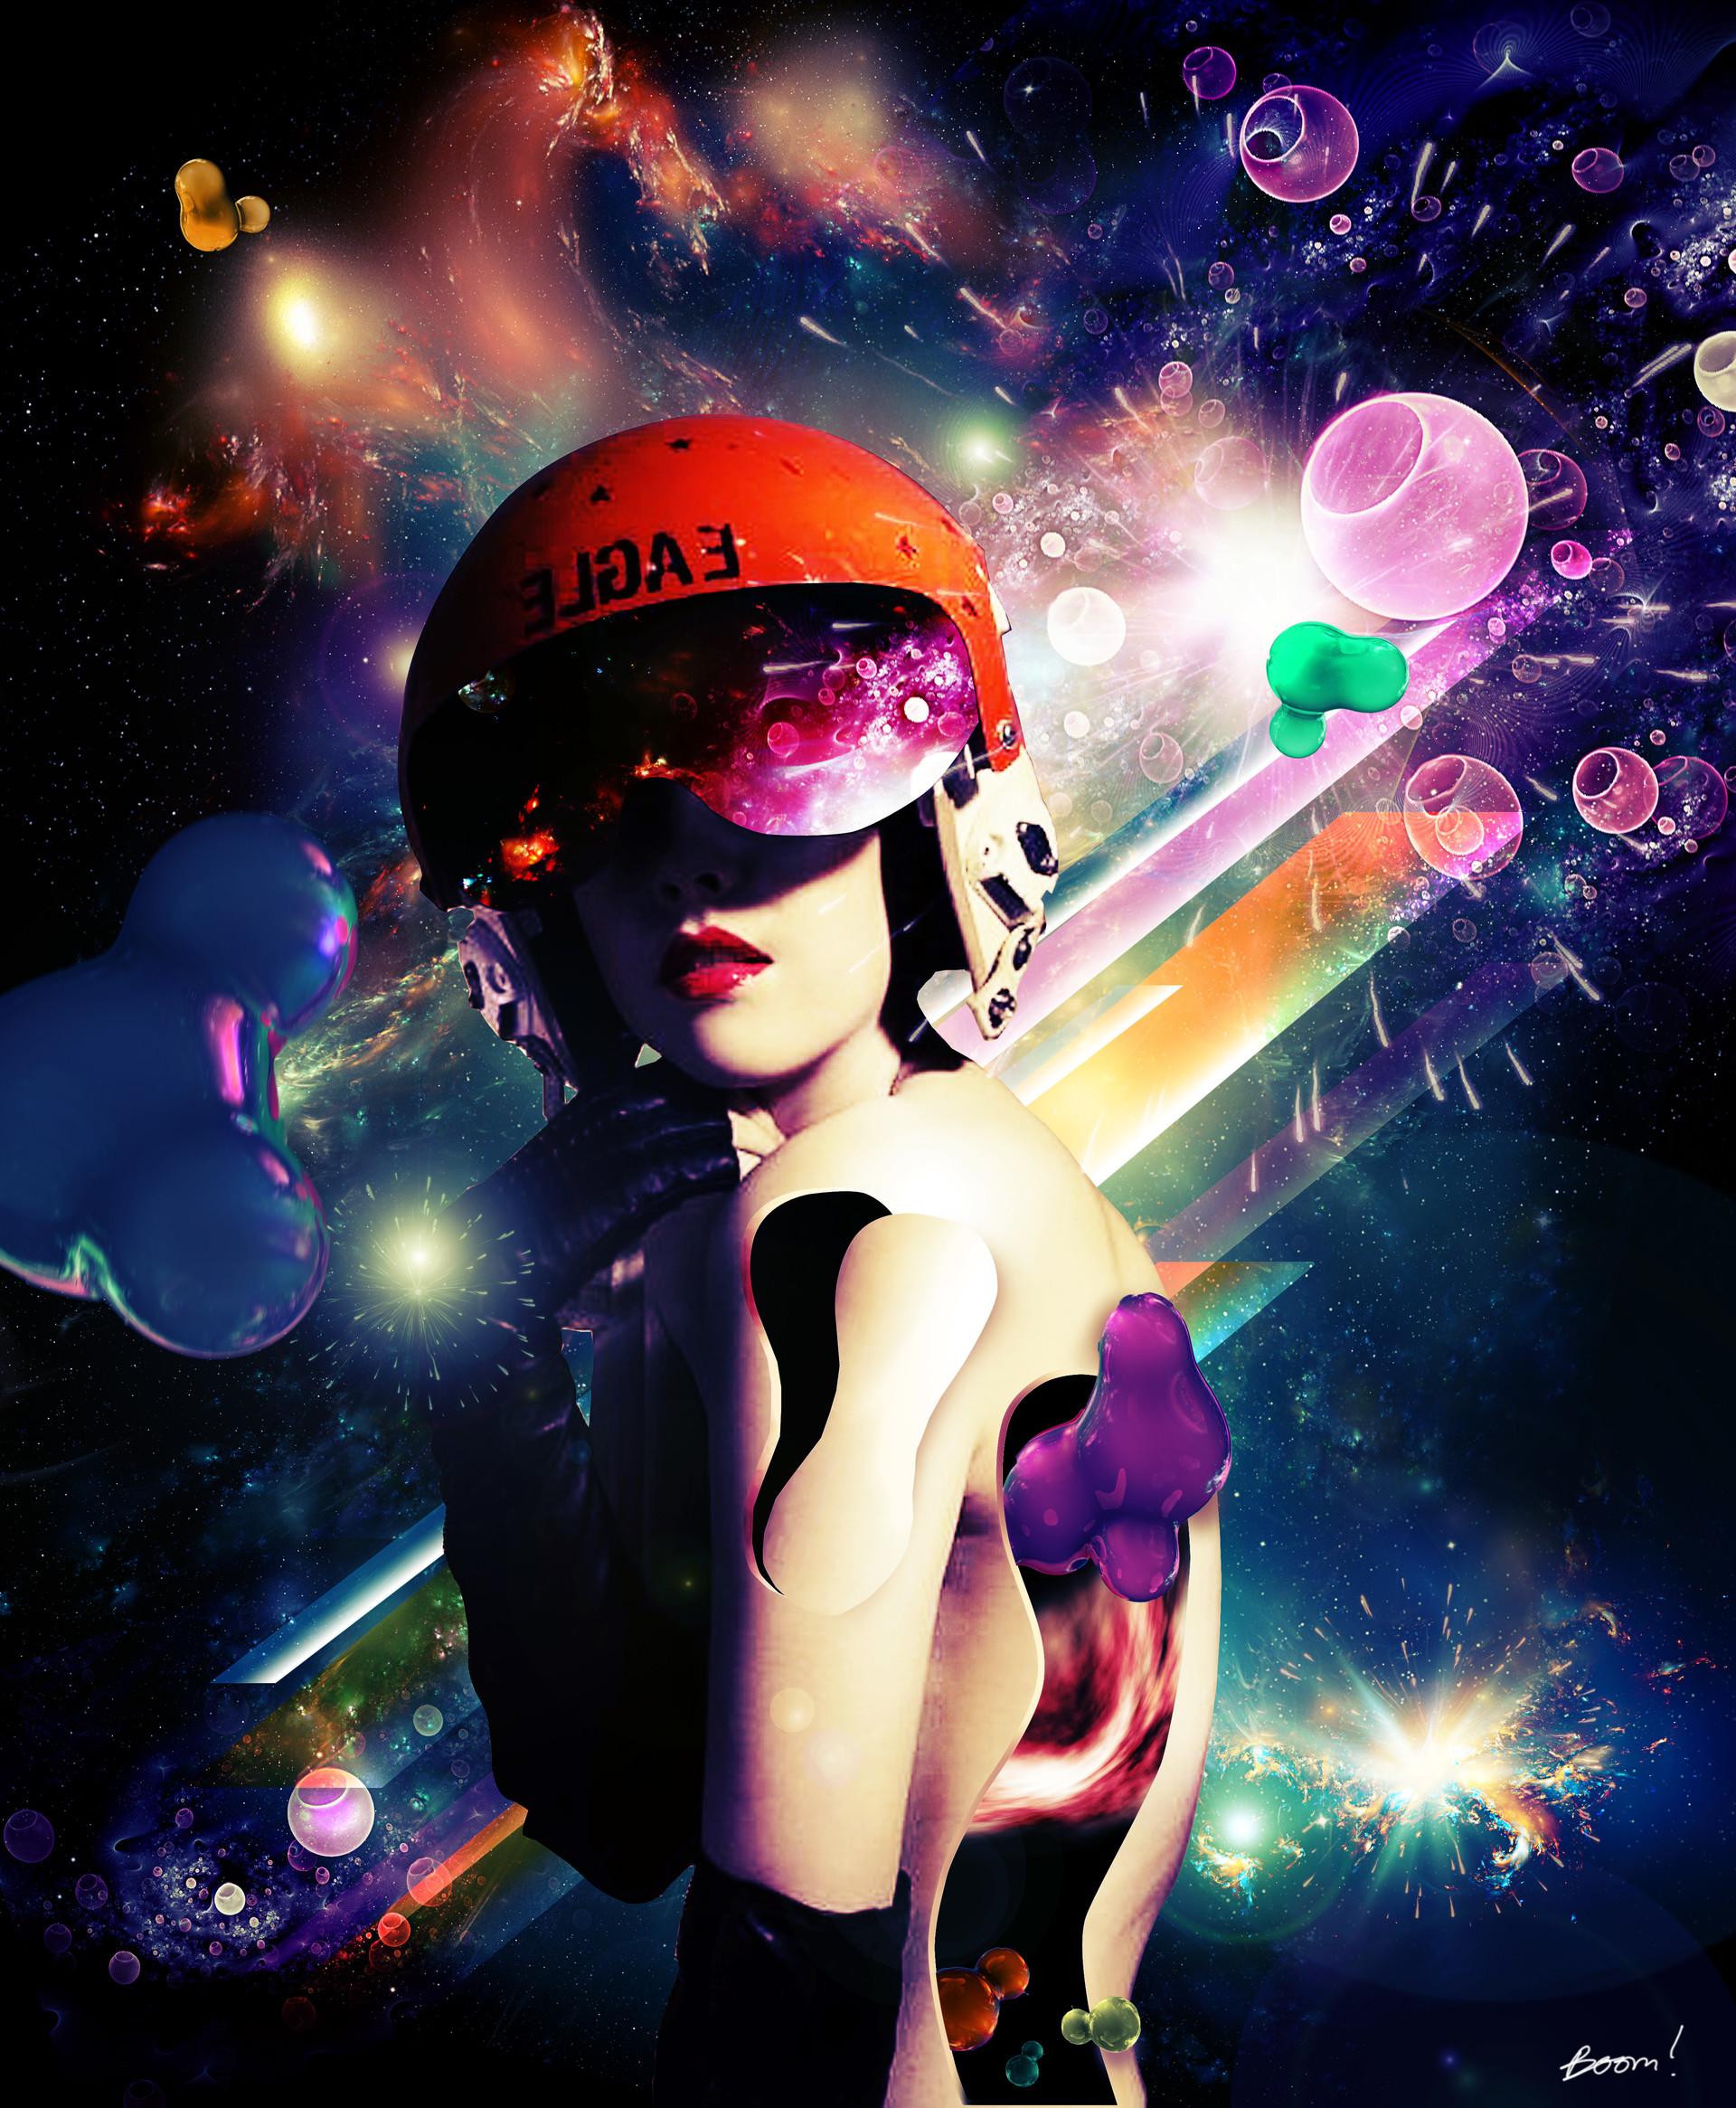 Obum asota nebula cosmo lady